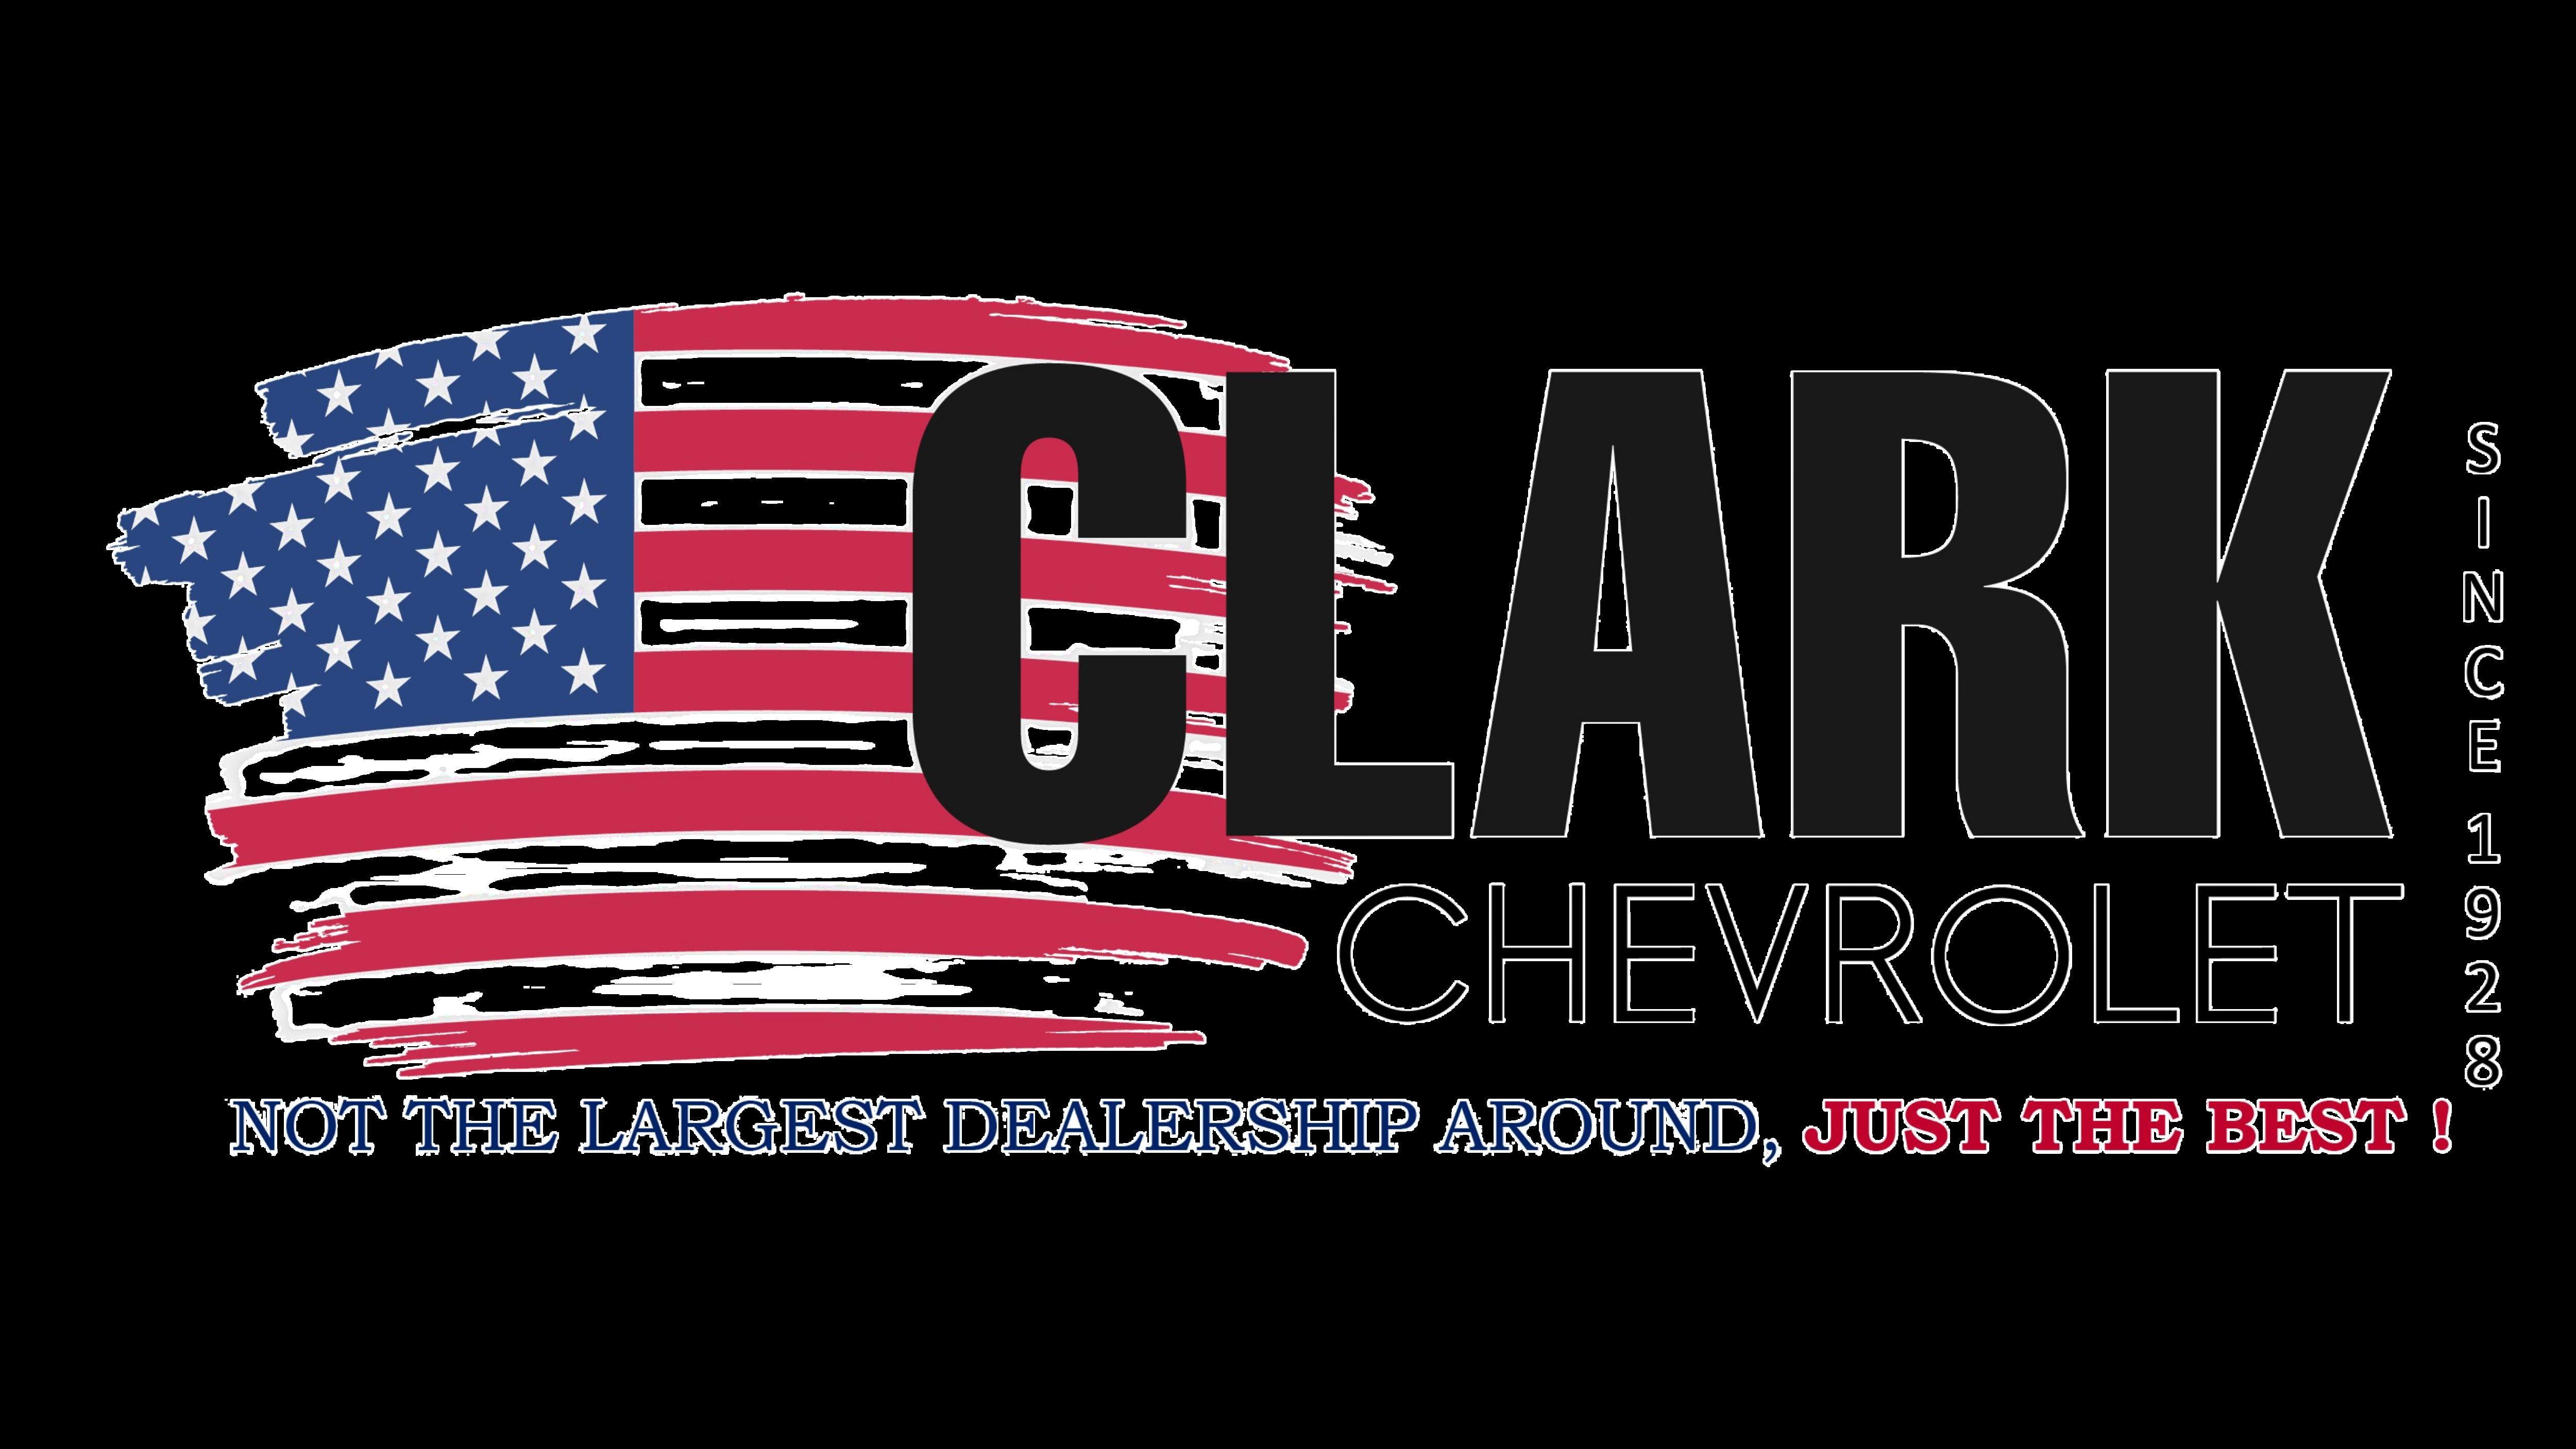 CLARK CHEVROLET LLC